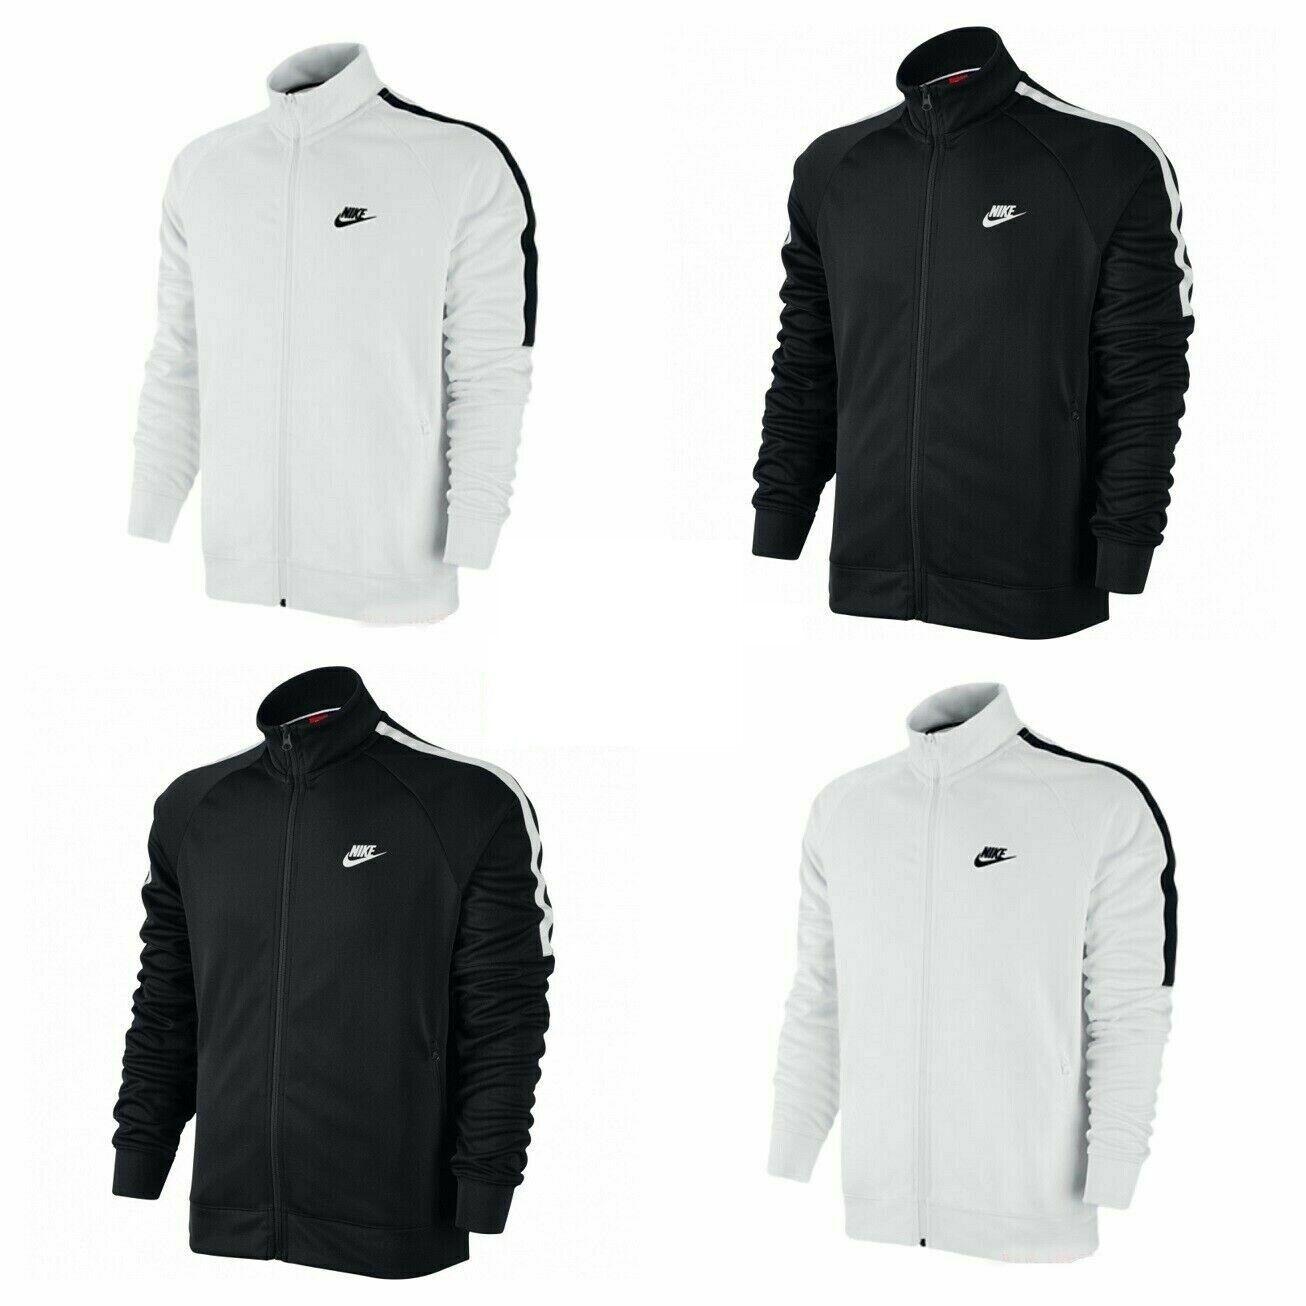 Nike Mens Jacket Tribute Training Sports Jackets Full Zip Top White Black